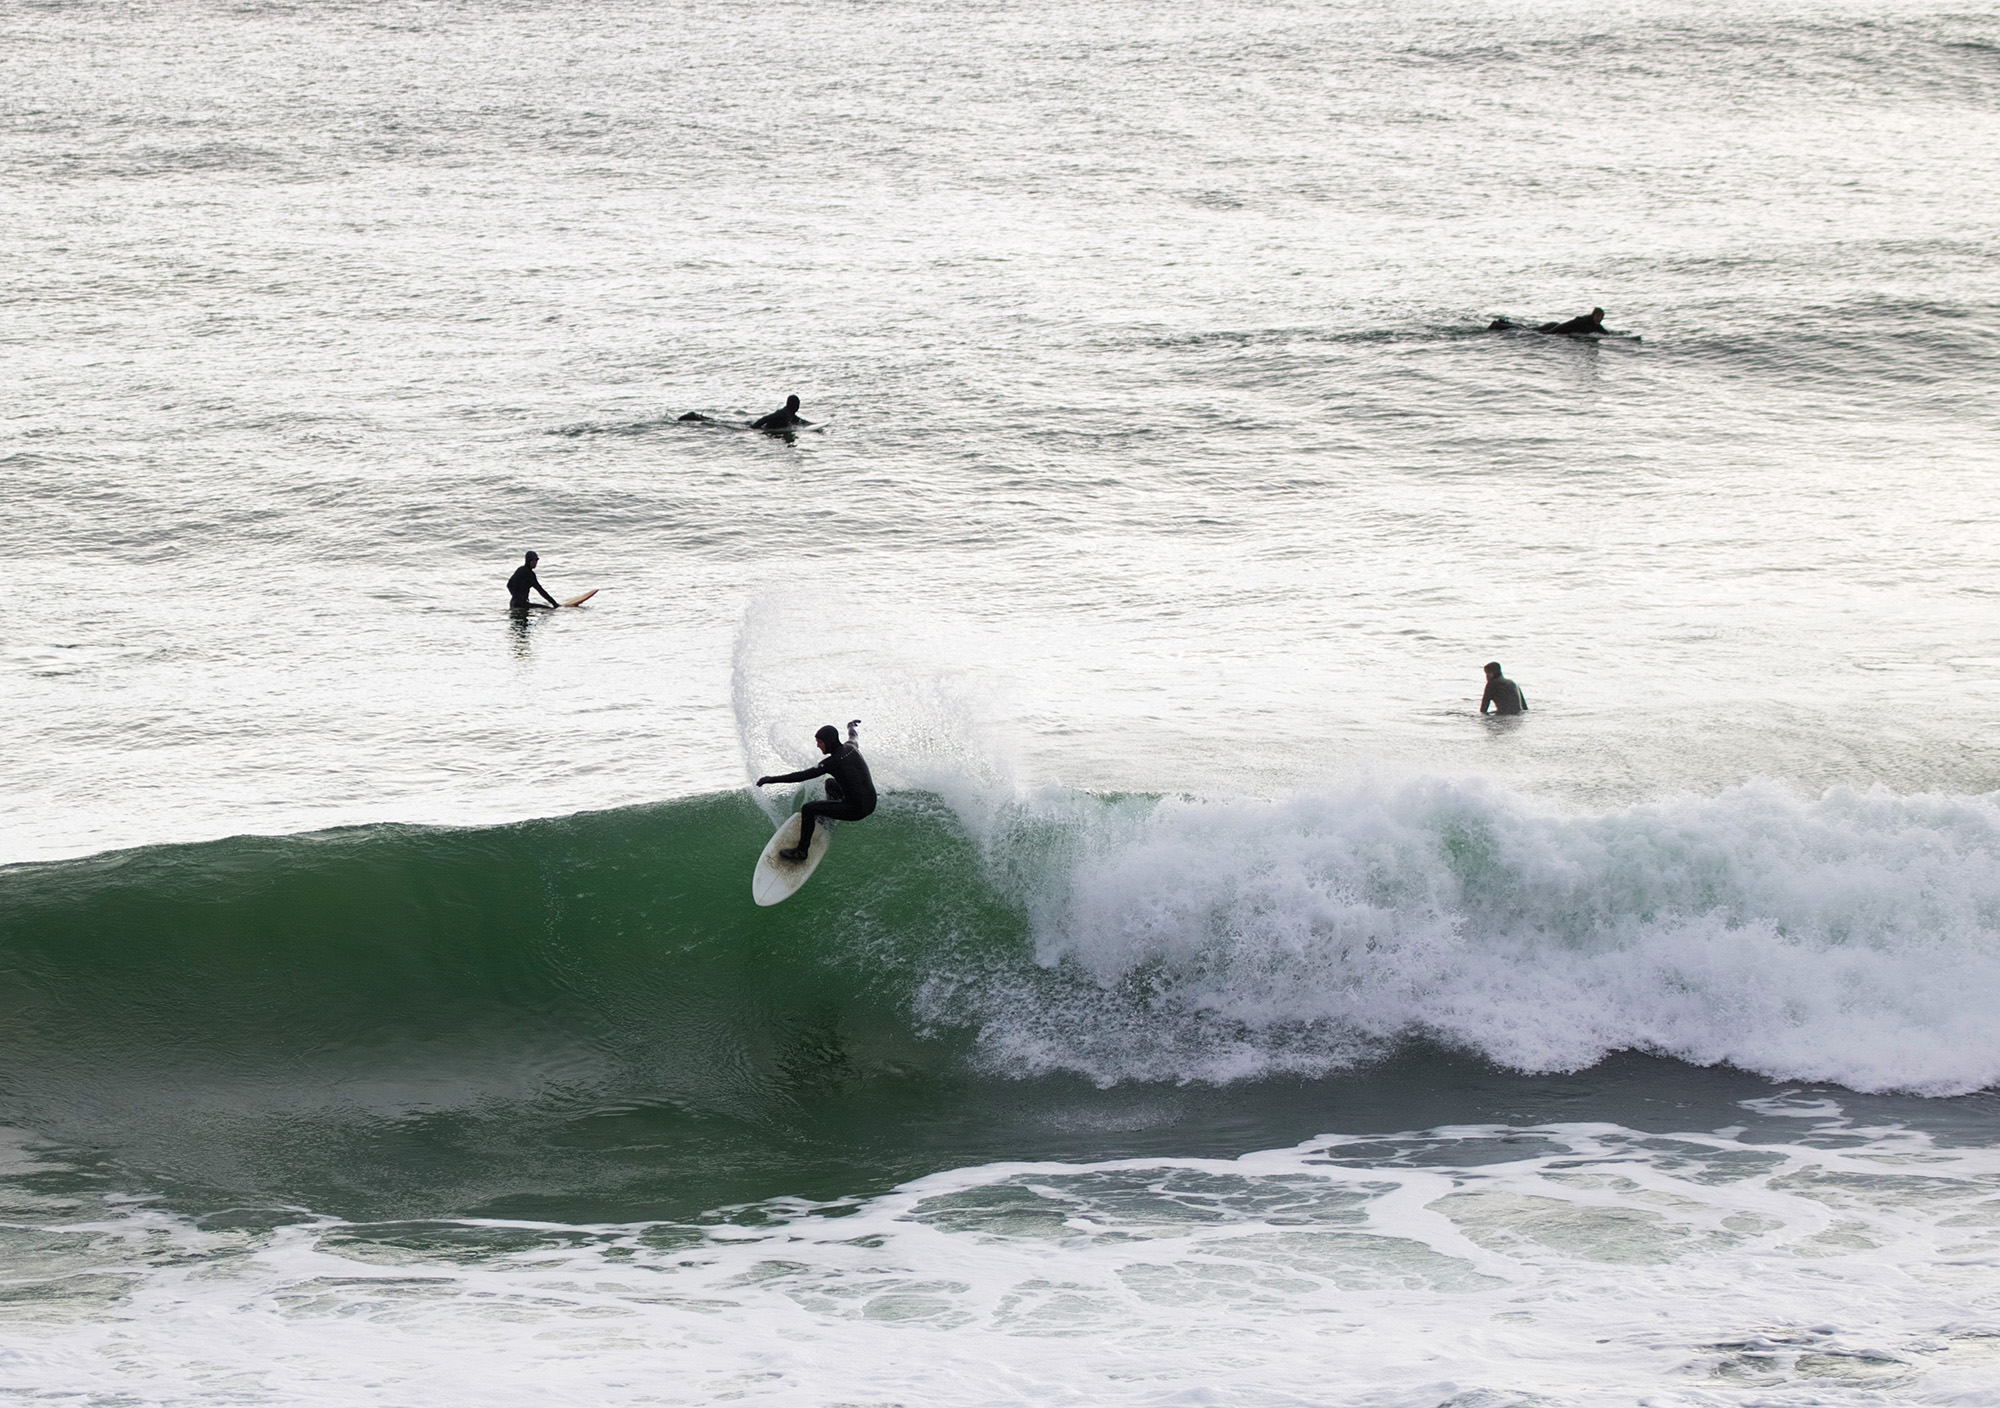 1-19-17 MTK Surfer 4.jpg